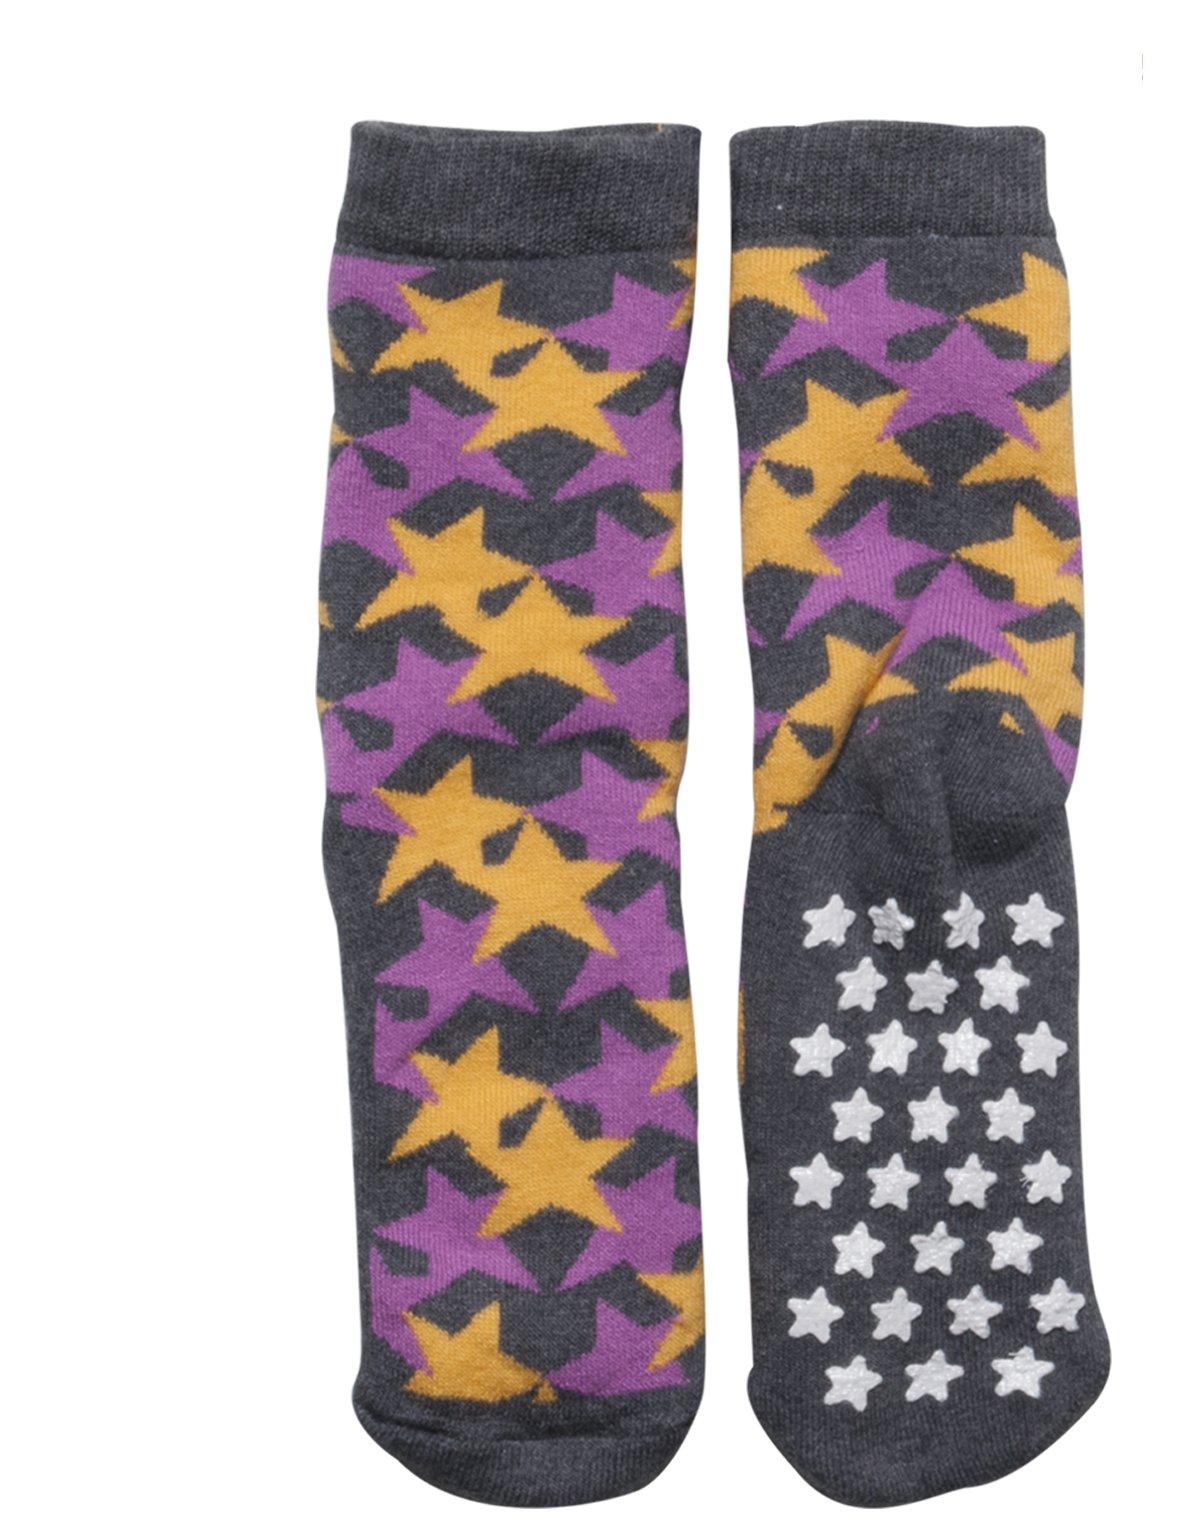 SLIPPER NON SKID SOCKS | KIDS ANTI SLIP COTTON SOCKS WITH STARS | ITALIAN HOSIERY | (USA: 7/11 = EU: 24/28, FUXIA) by CALZITALY (Image #3)